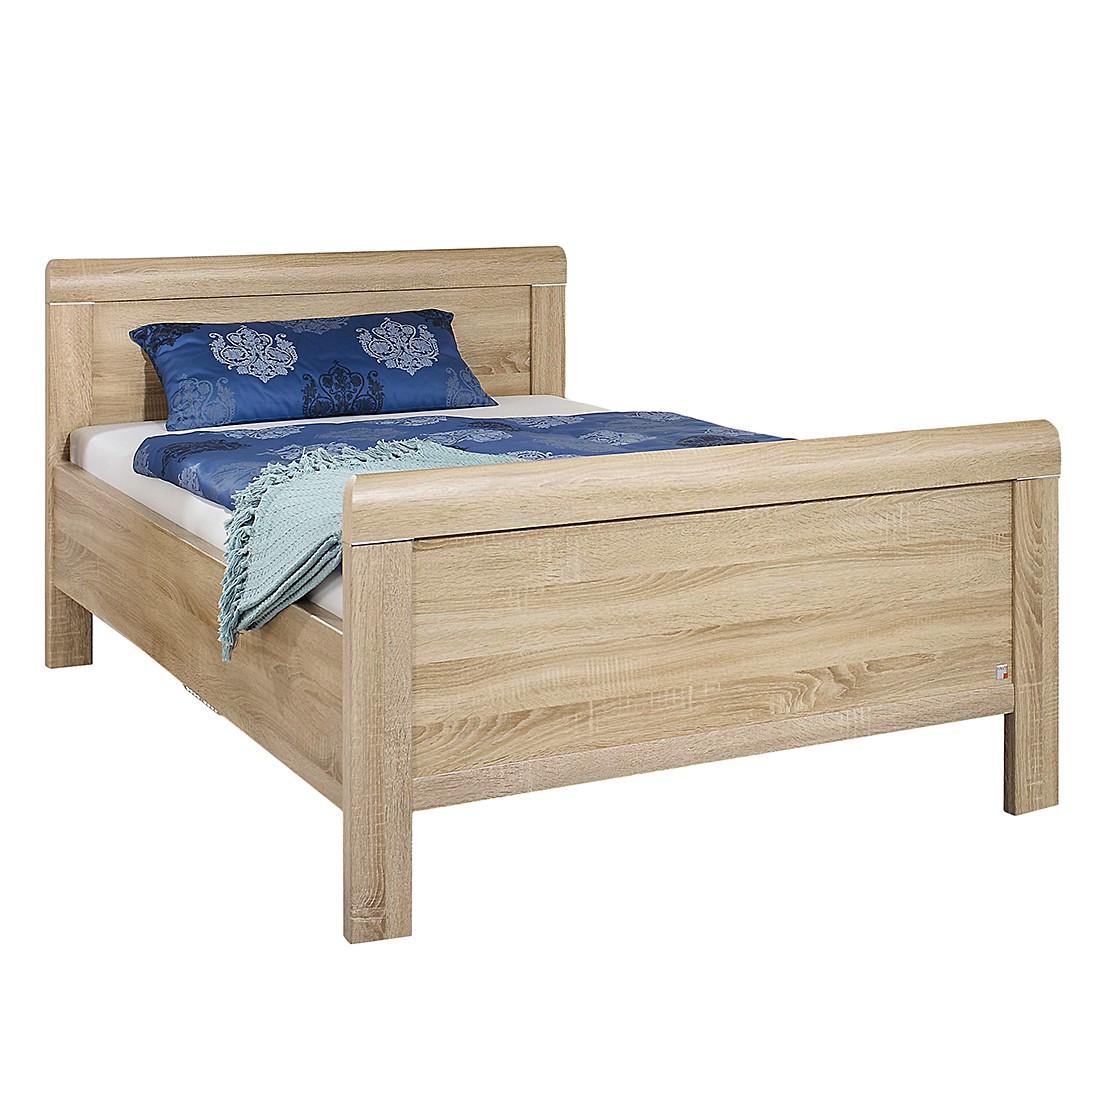 Comfortabel bed Evelyn - Sonoma eikenhouen look - 100 x 190cm, Rauch Dialog